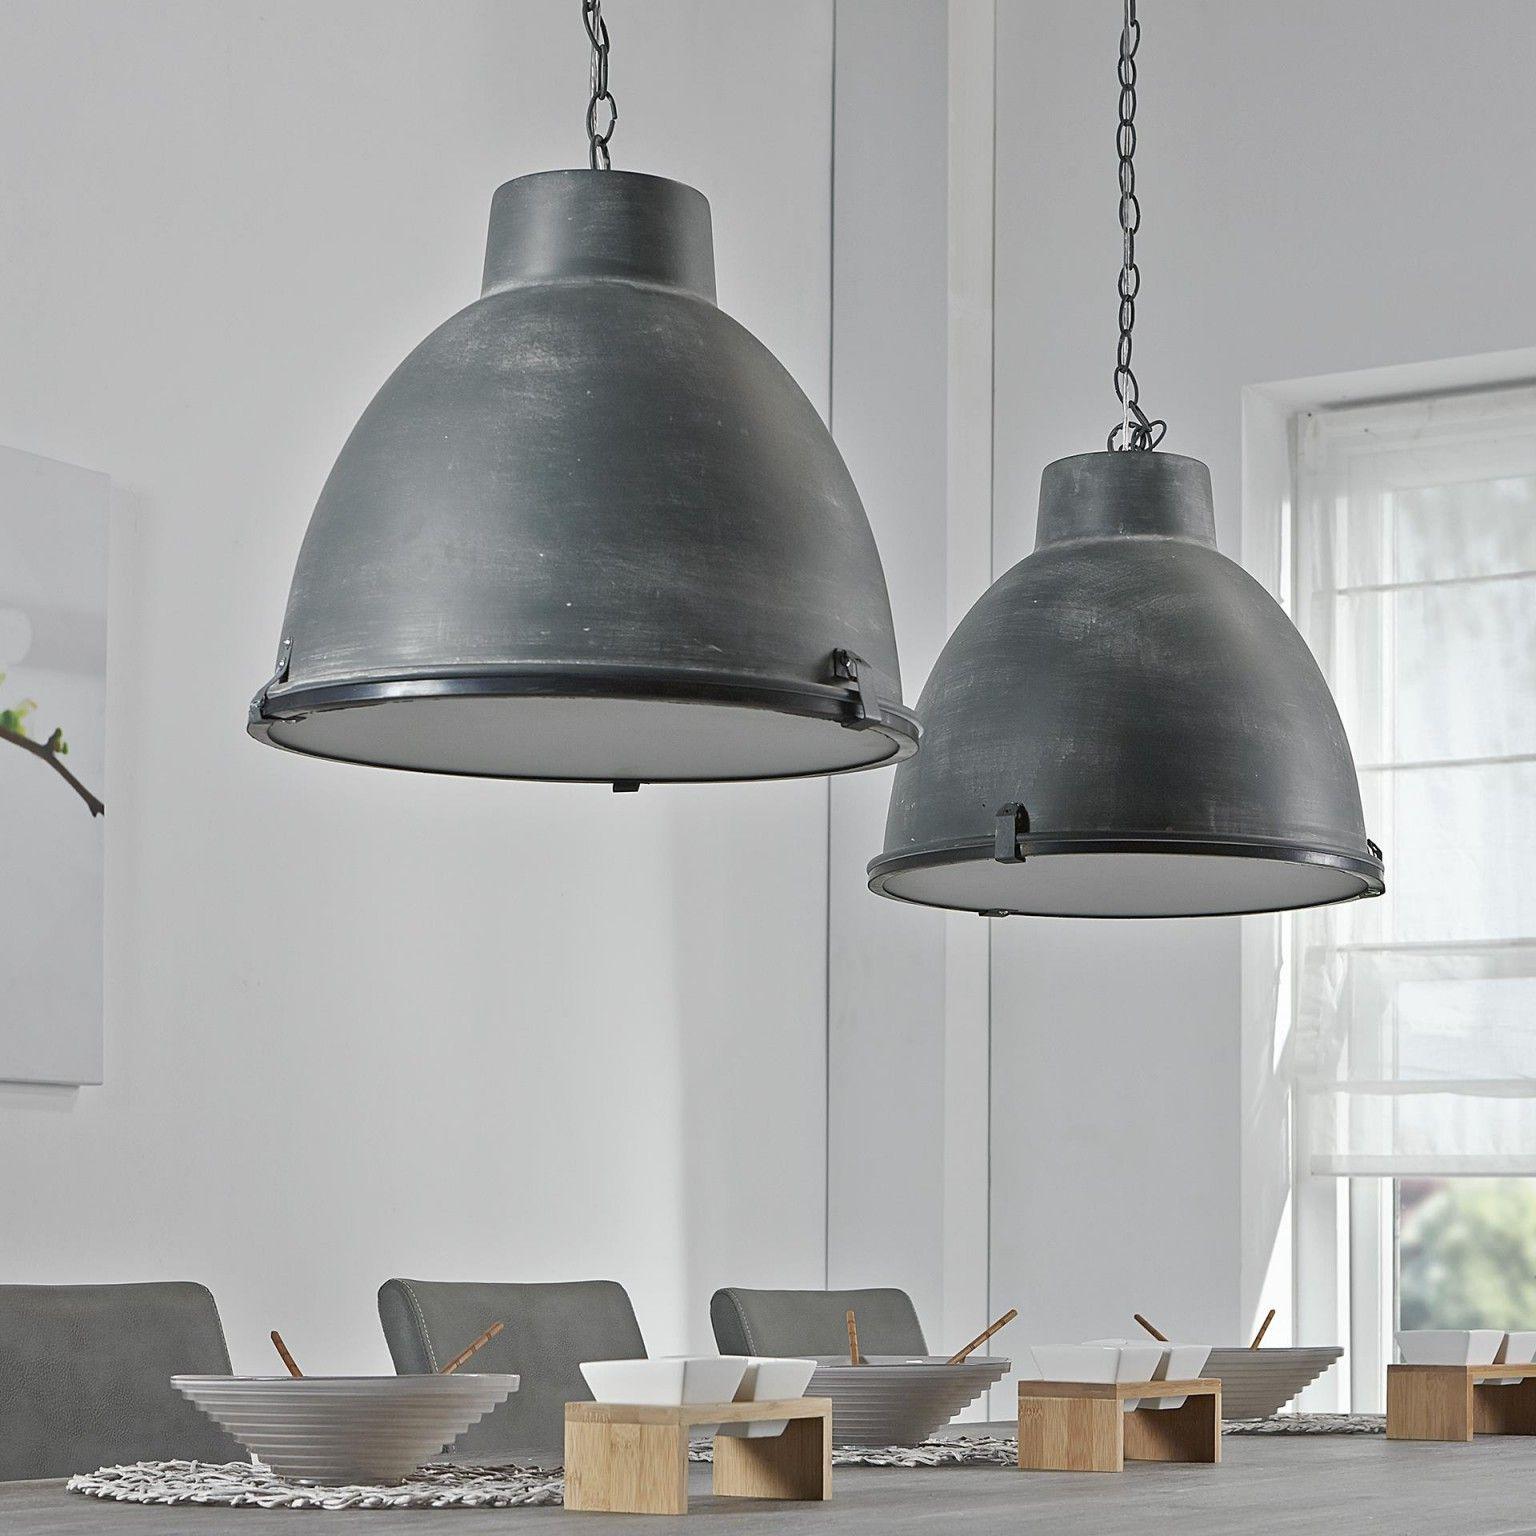 Industrile Hanglamp Brigida met dubbele kap kleur